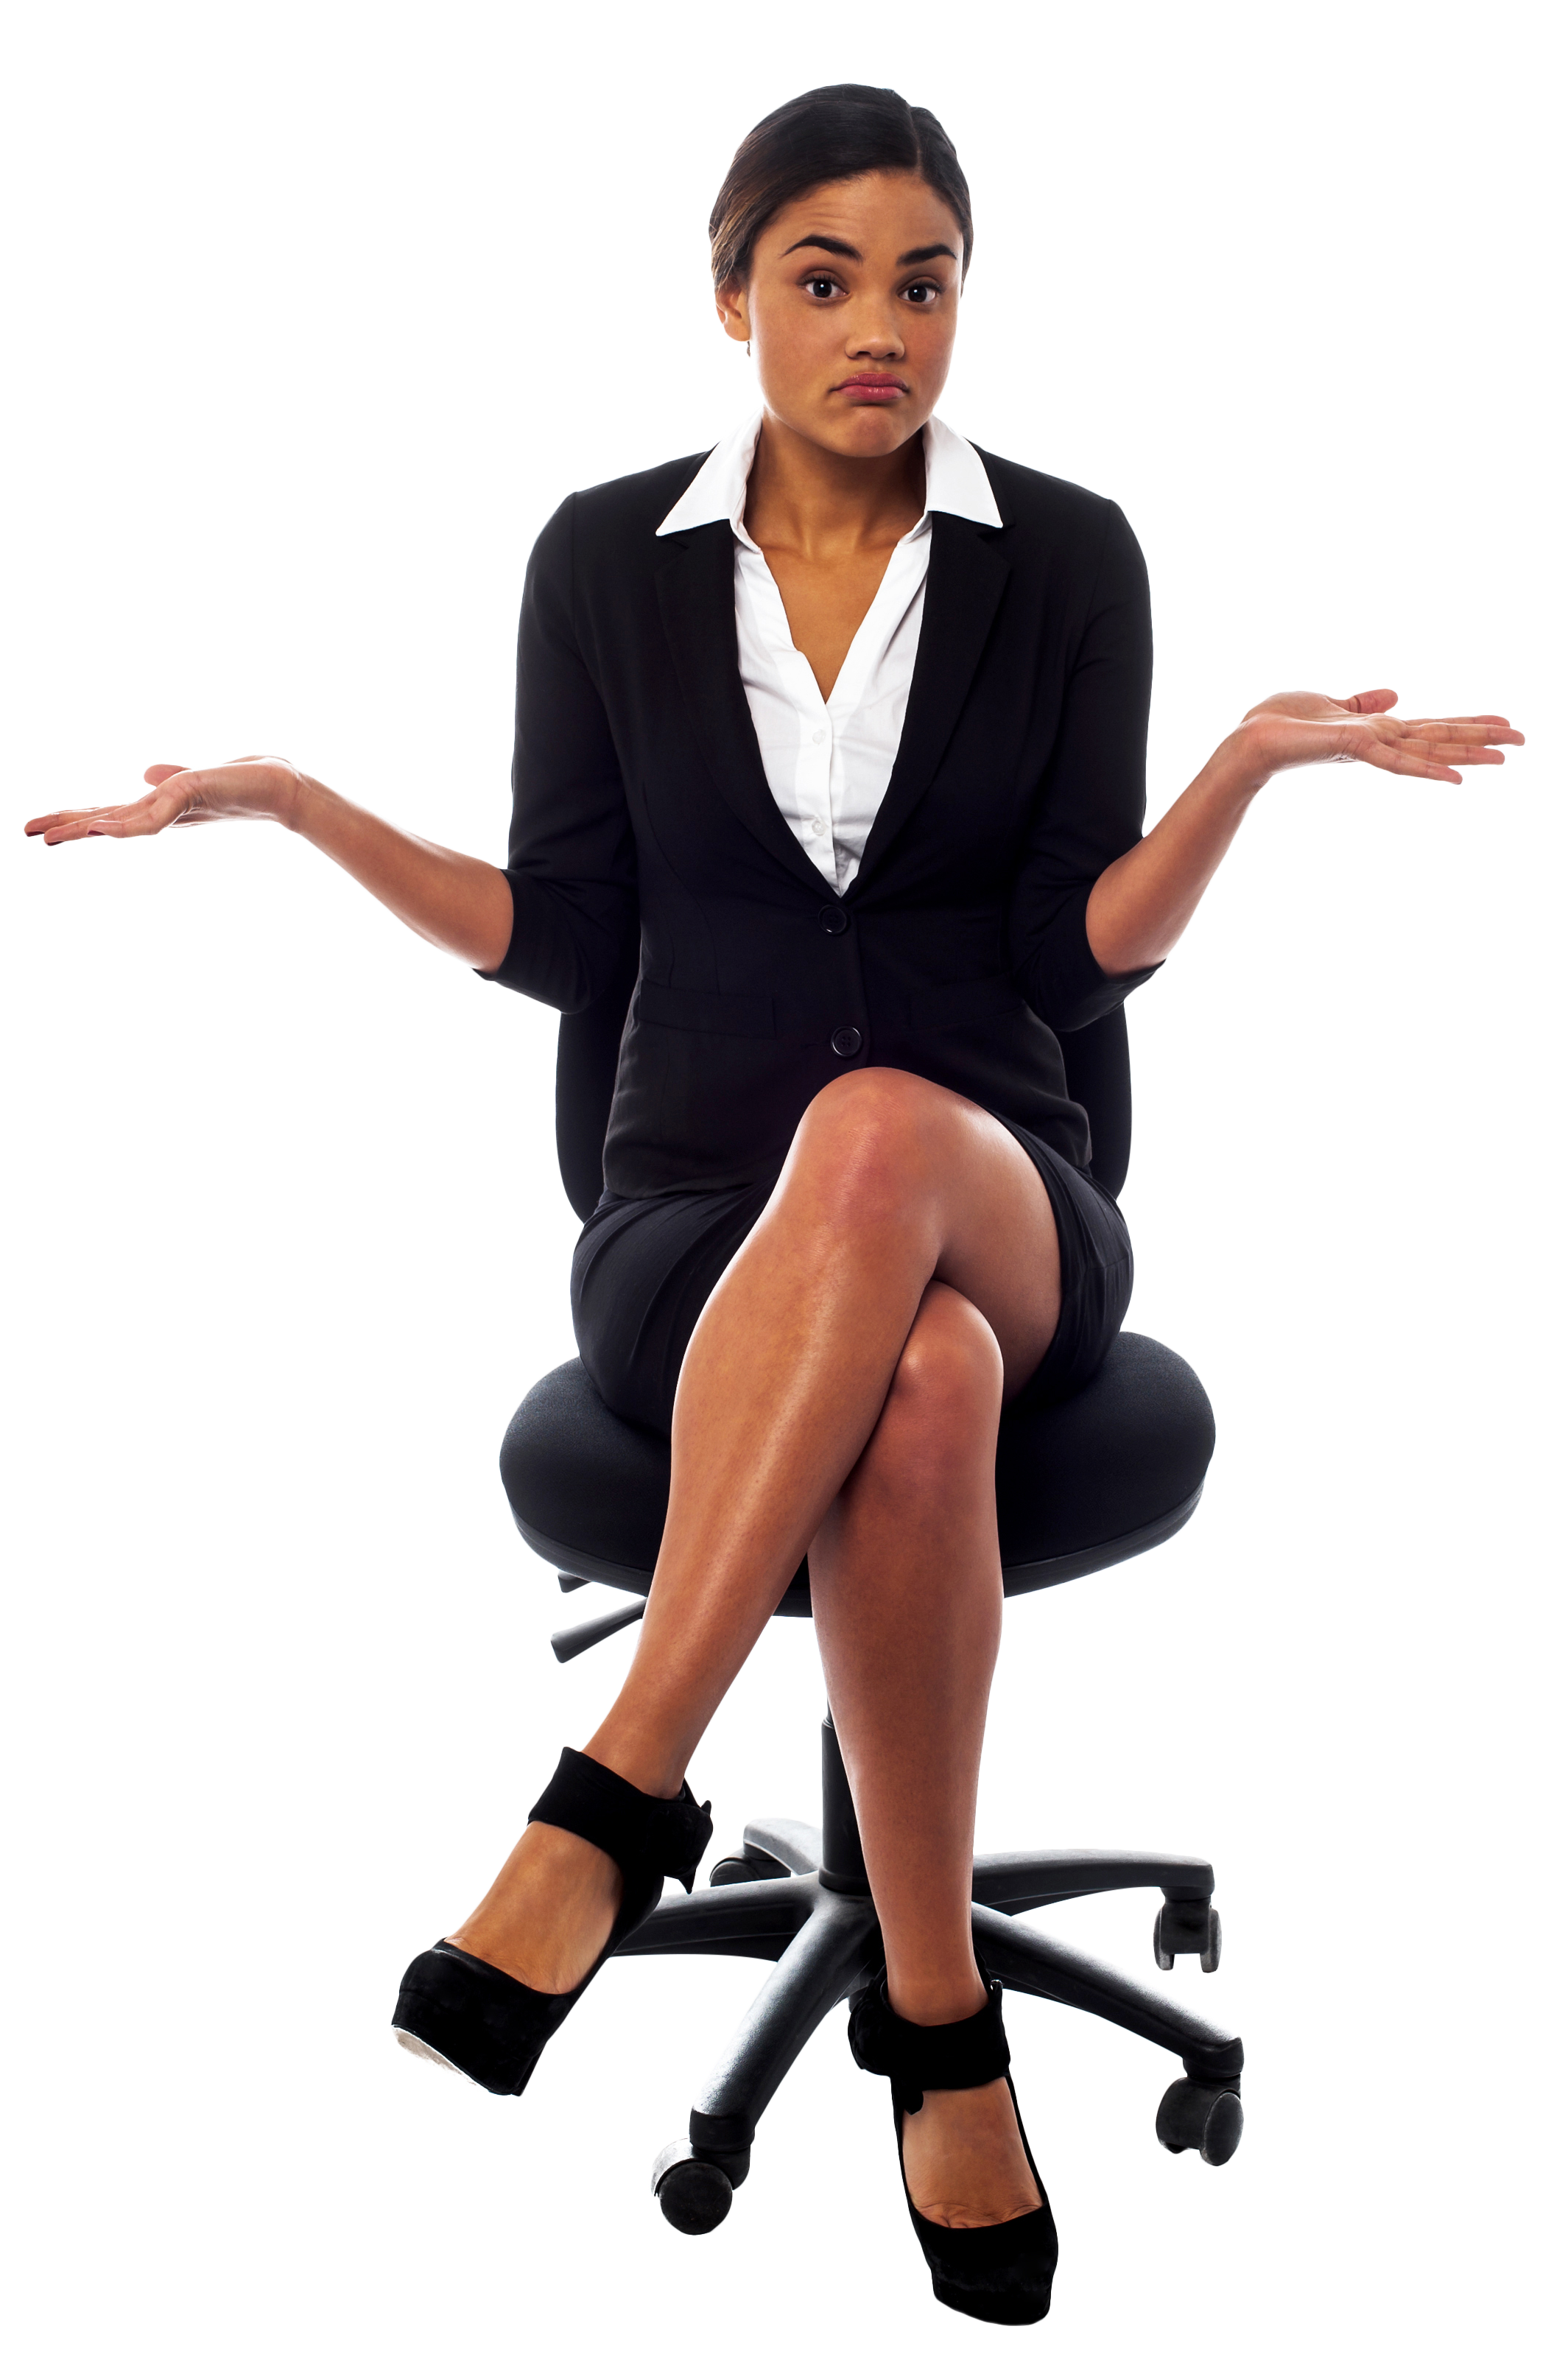 Women In Suit PNG Image - PurePNG | Free transparent CC0